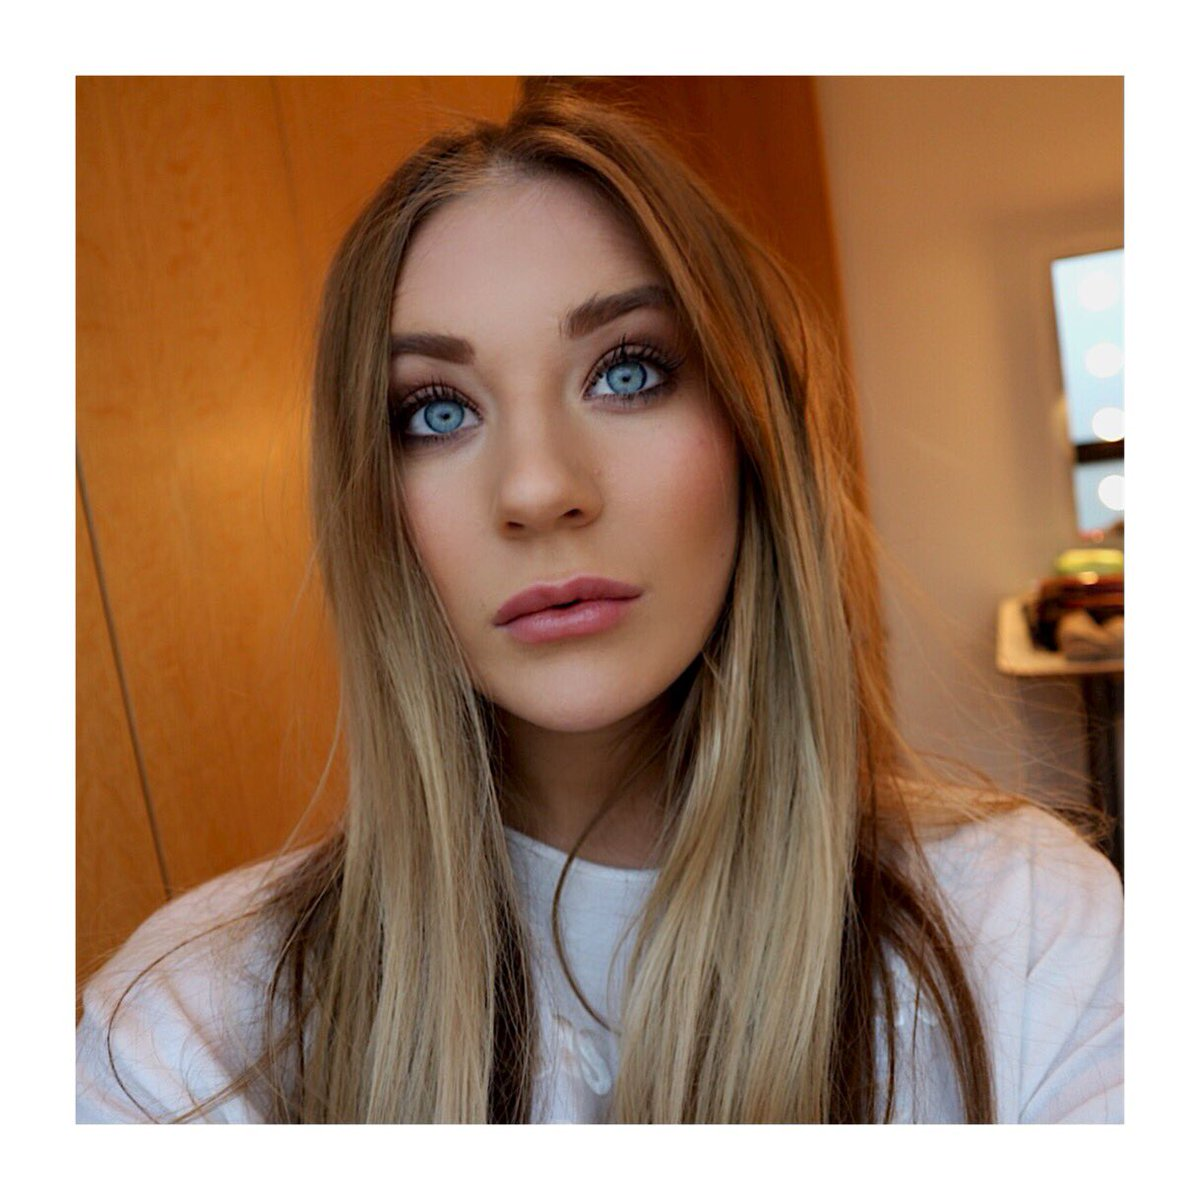 Hacked Beth Lily nude photos 2019